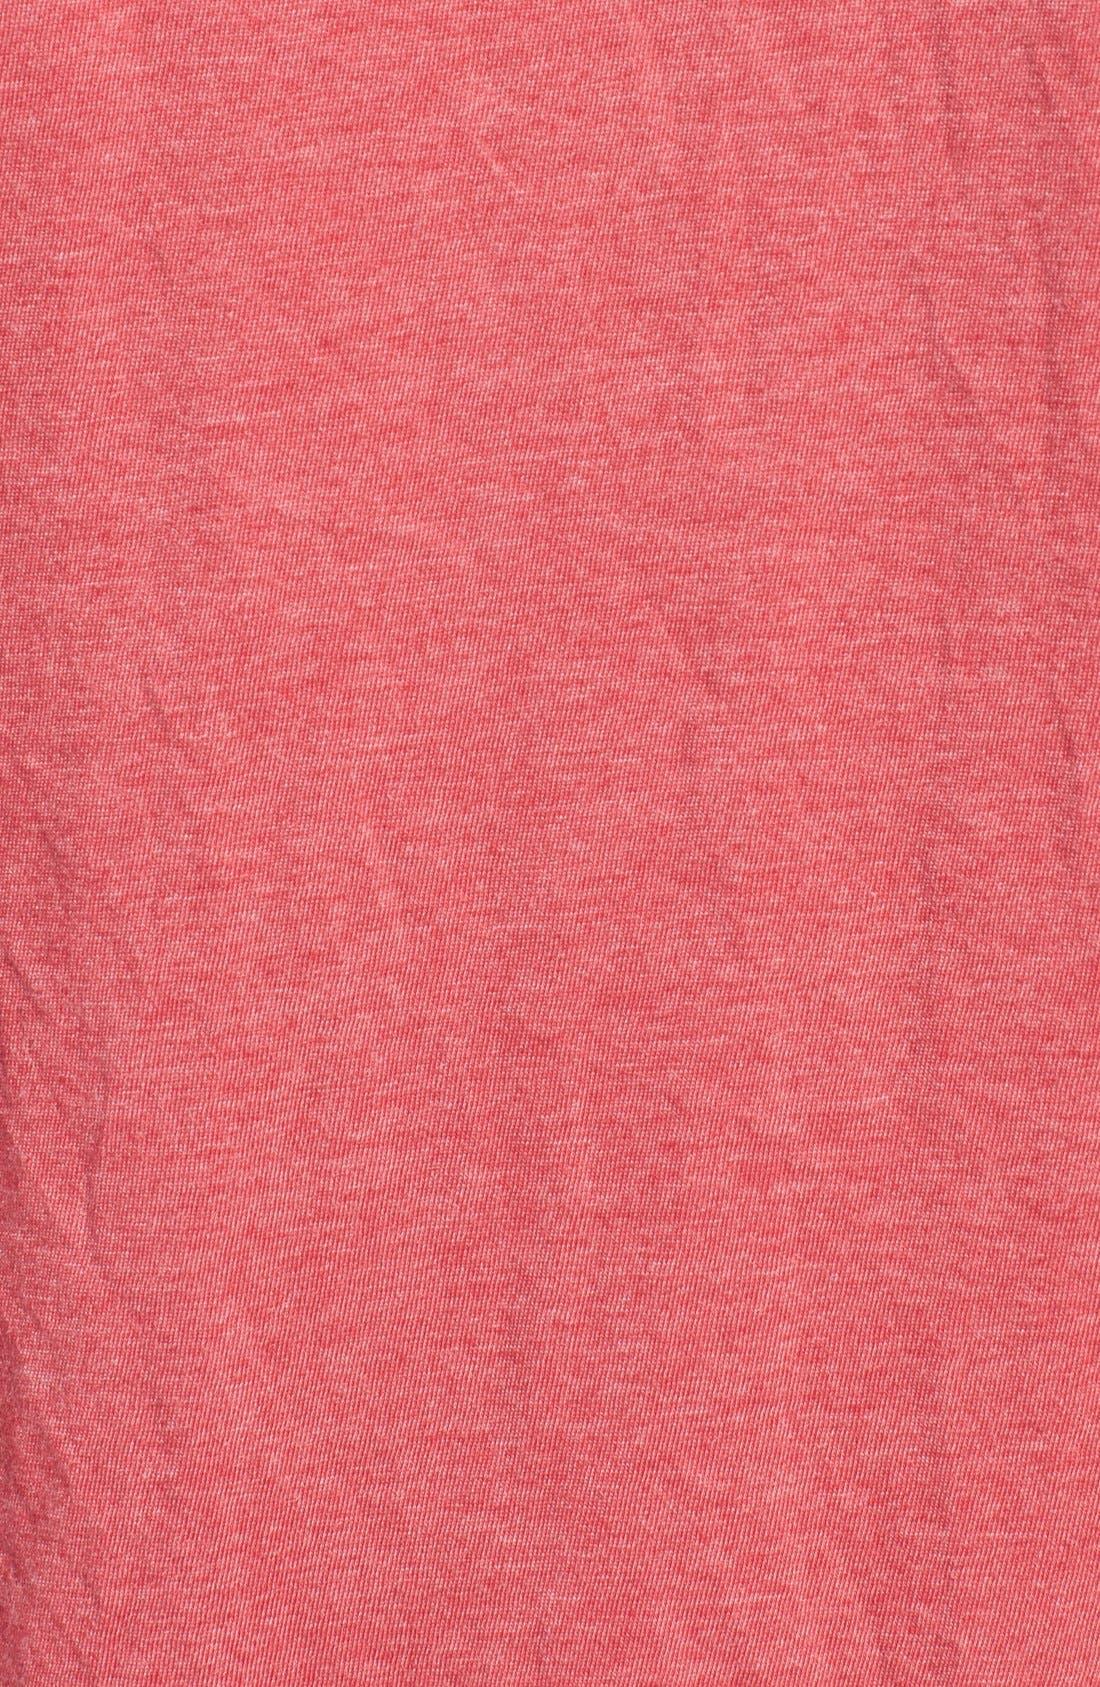 'California Angels' Graphic V-Neck T-Shirt,                             Alternate thumbnail 5, color,